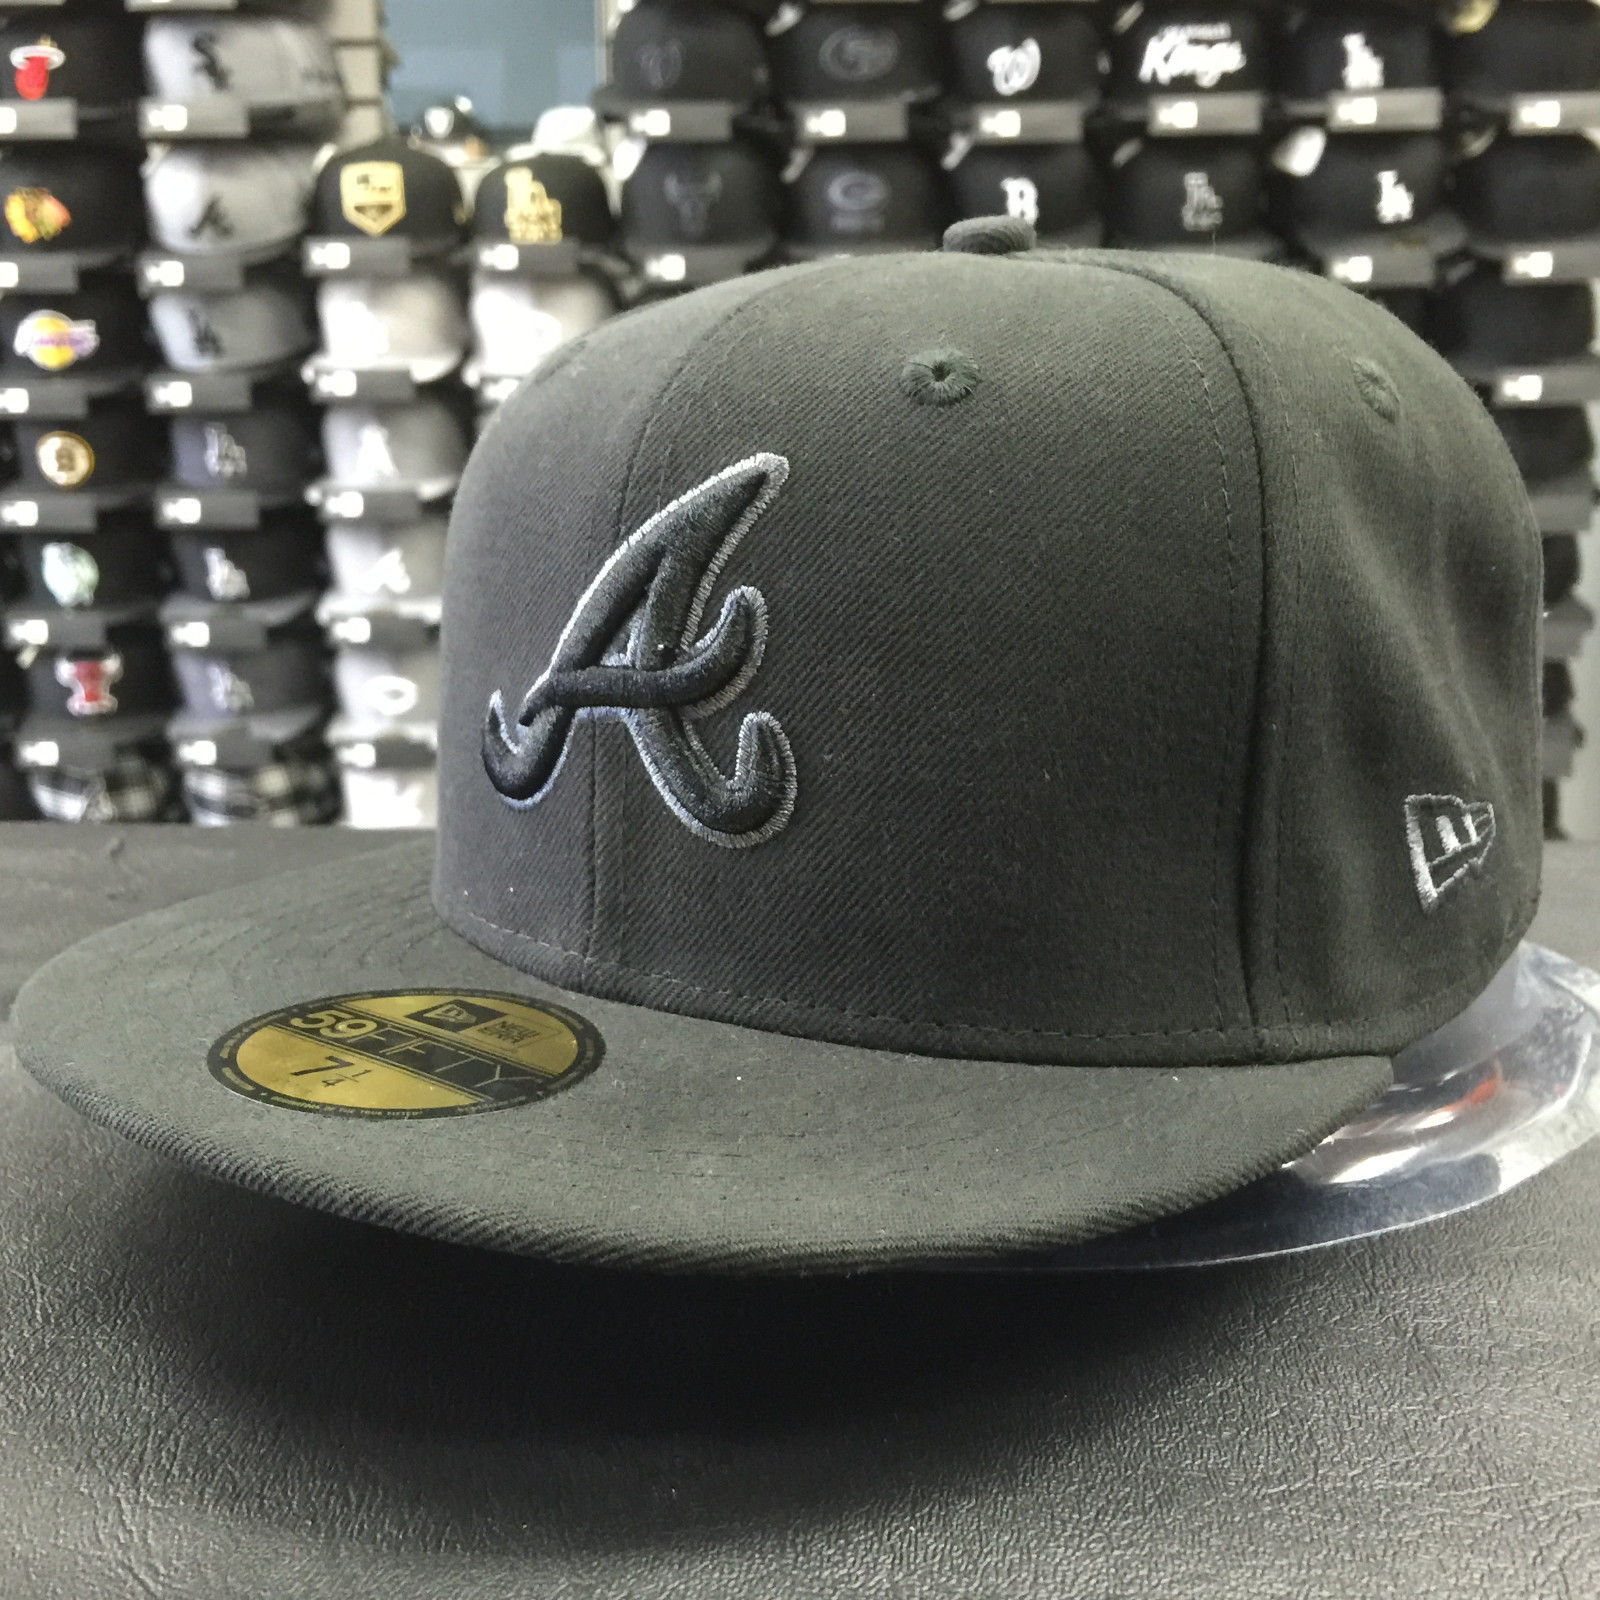 New Era 59Fifty MLB Atlanta Braves Black Gray Basic Fitted Cap